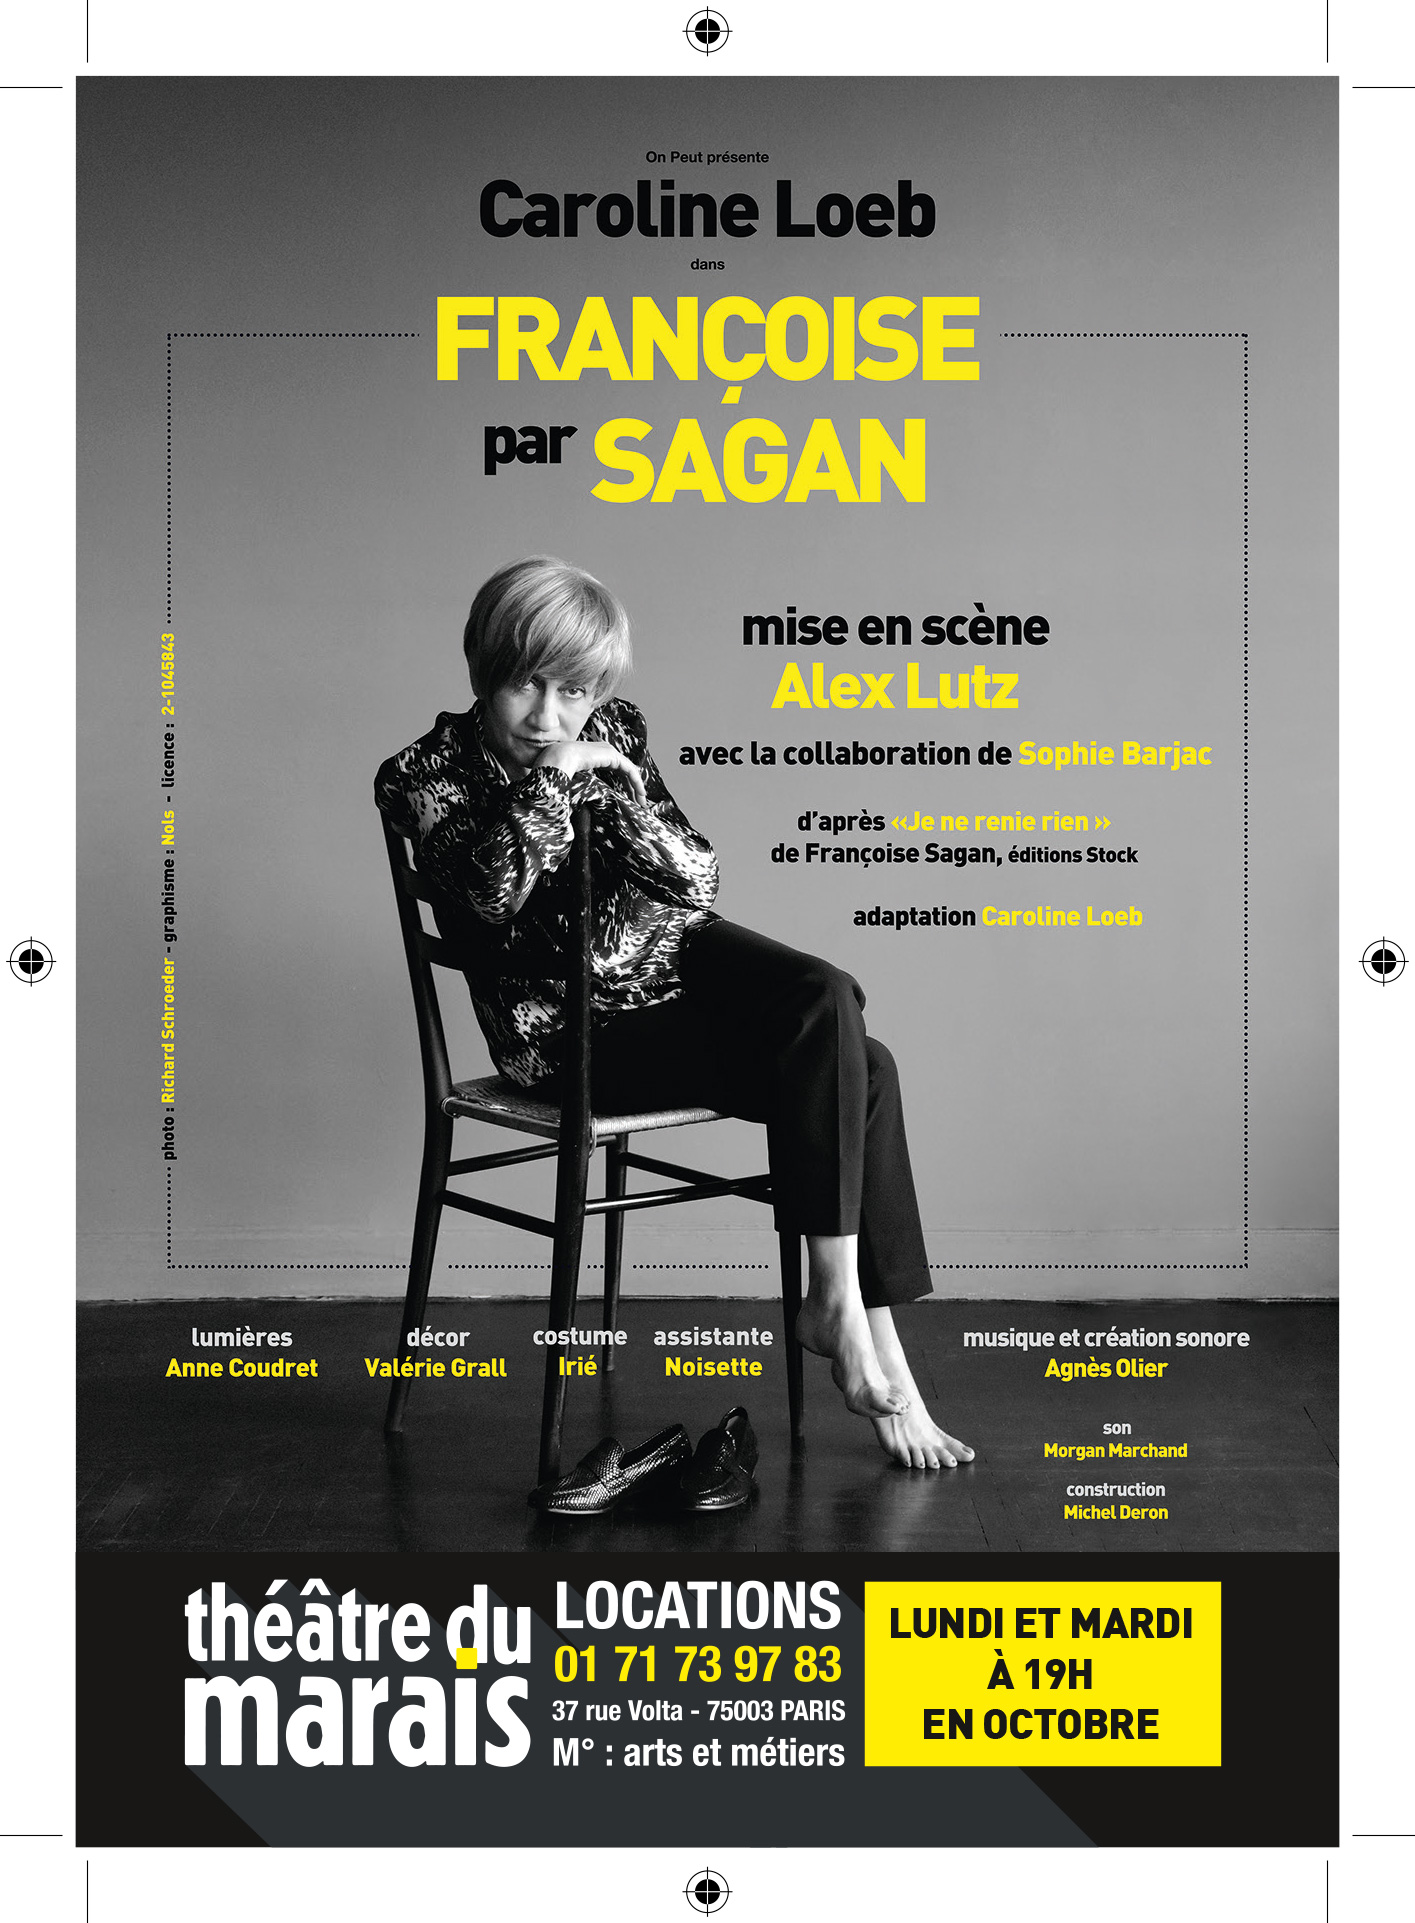 francoiseparsagan_10x15_theatremarais_octobre2016_print-1